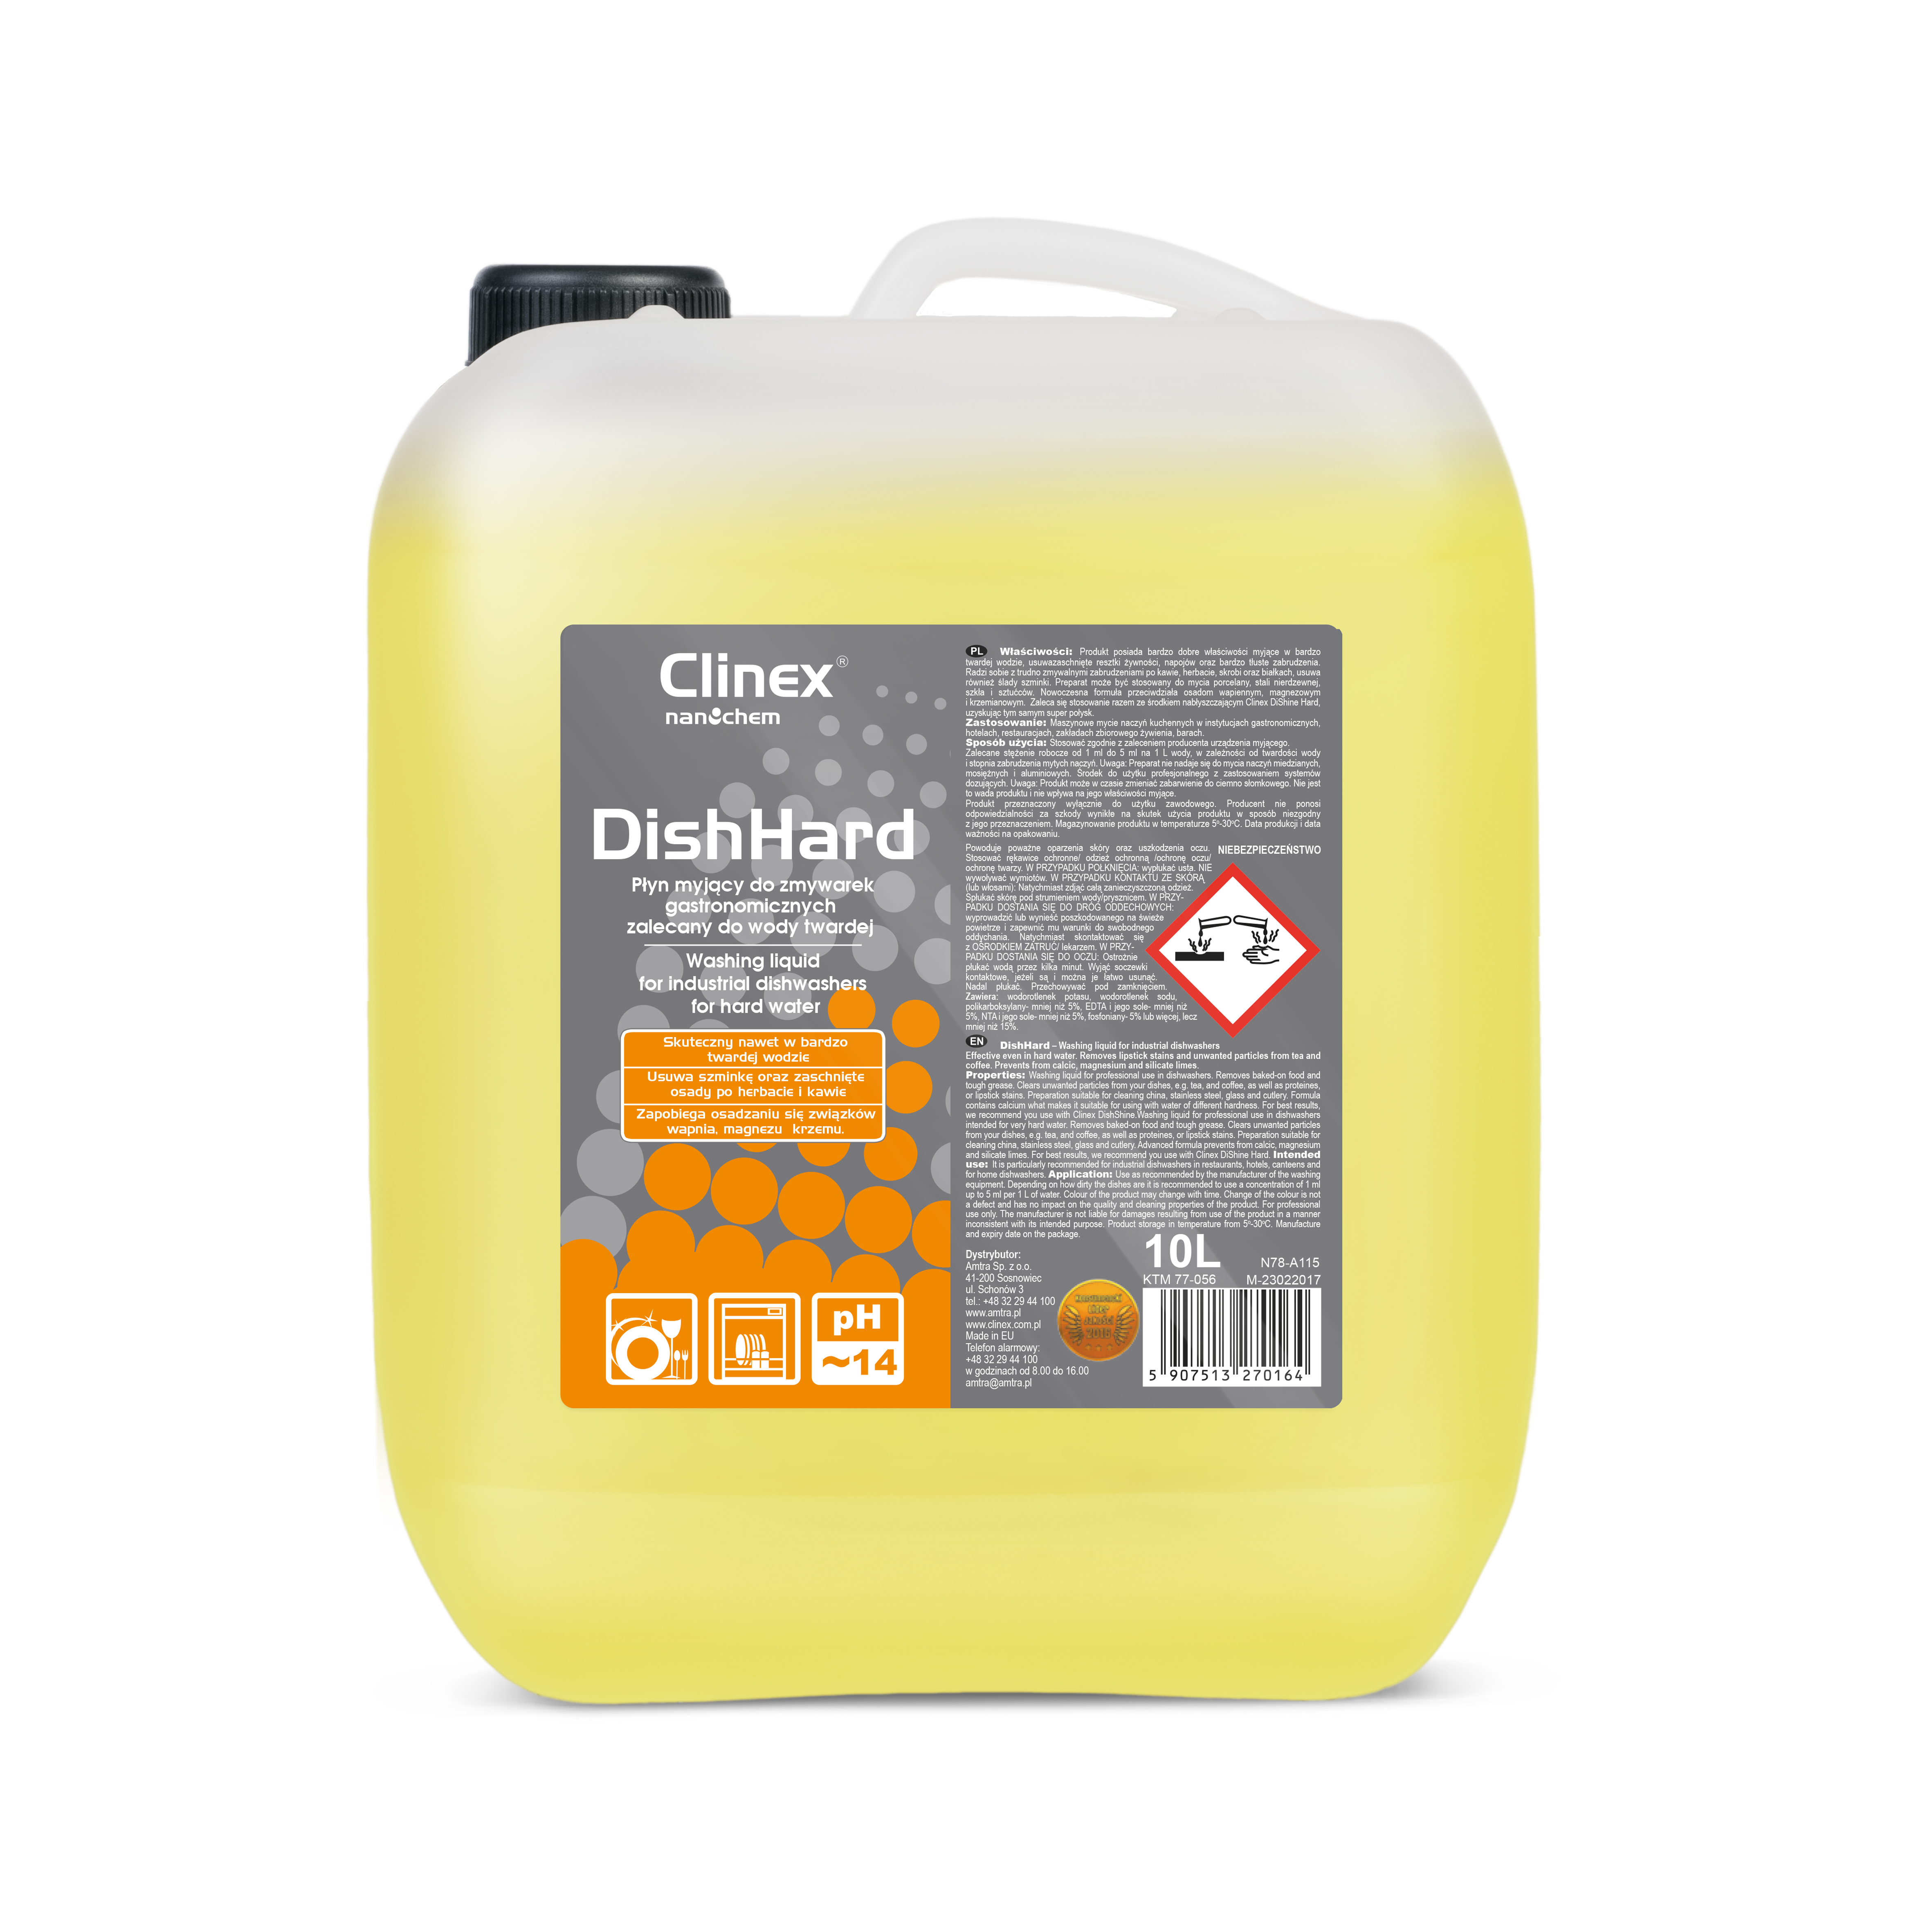 Clinex DishHard